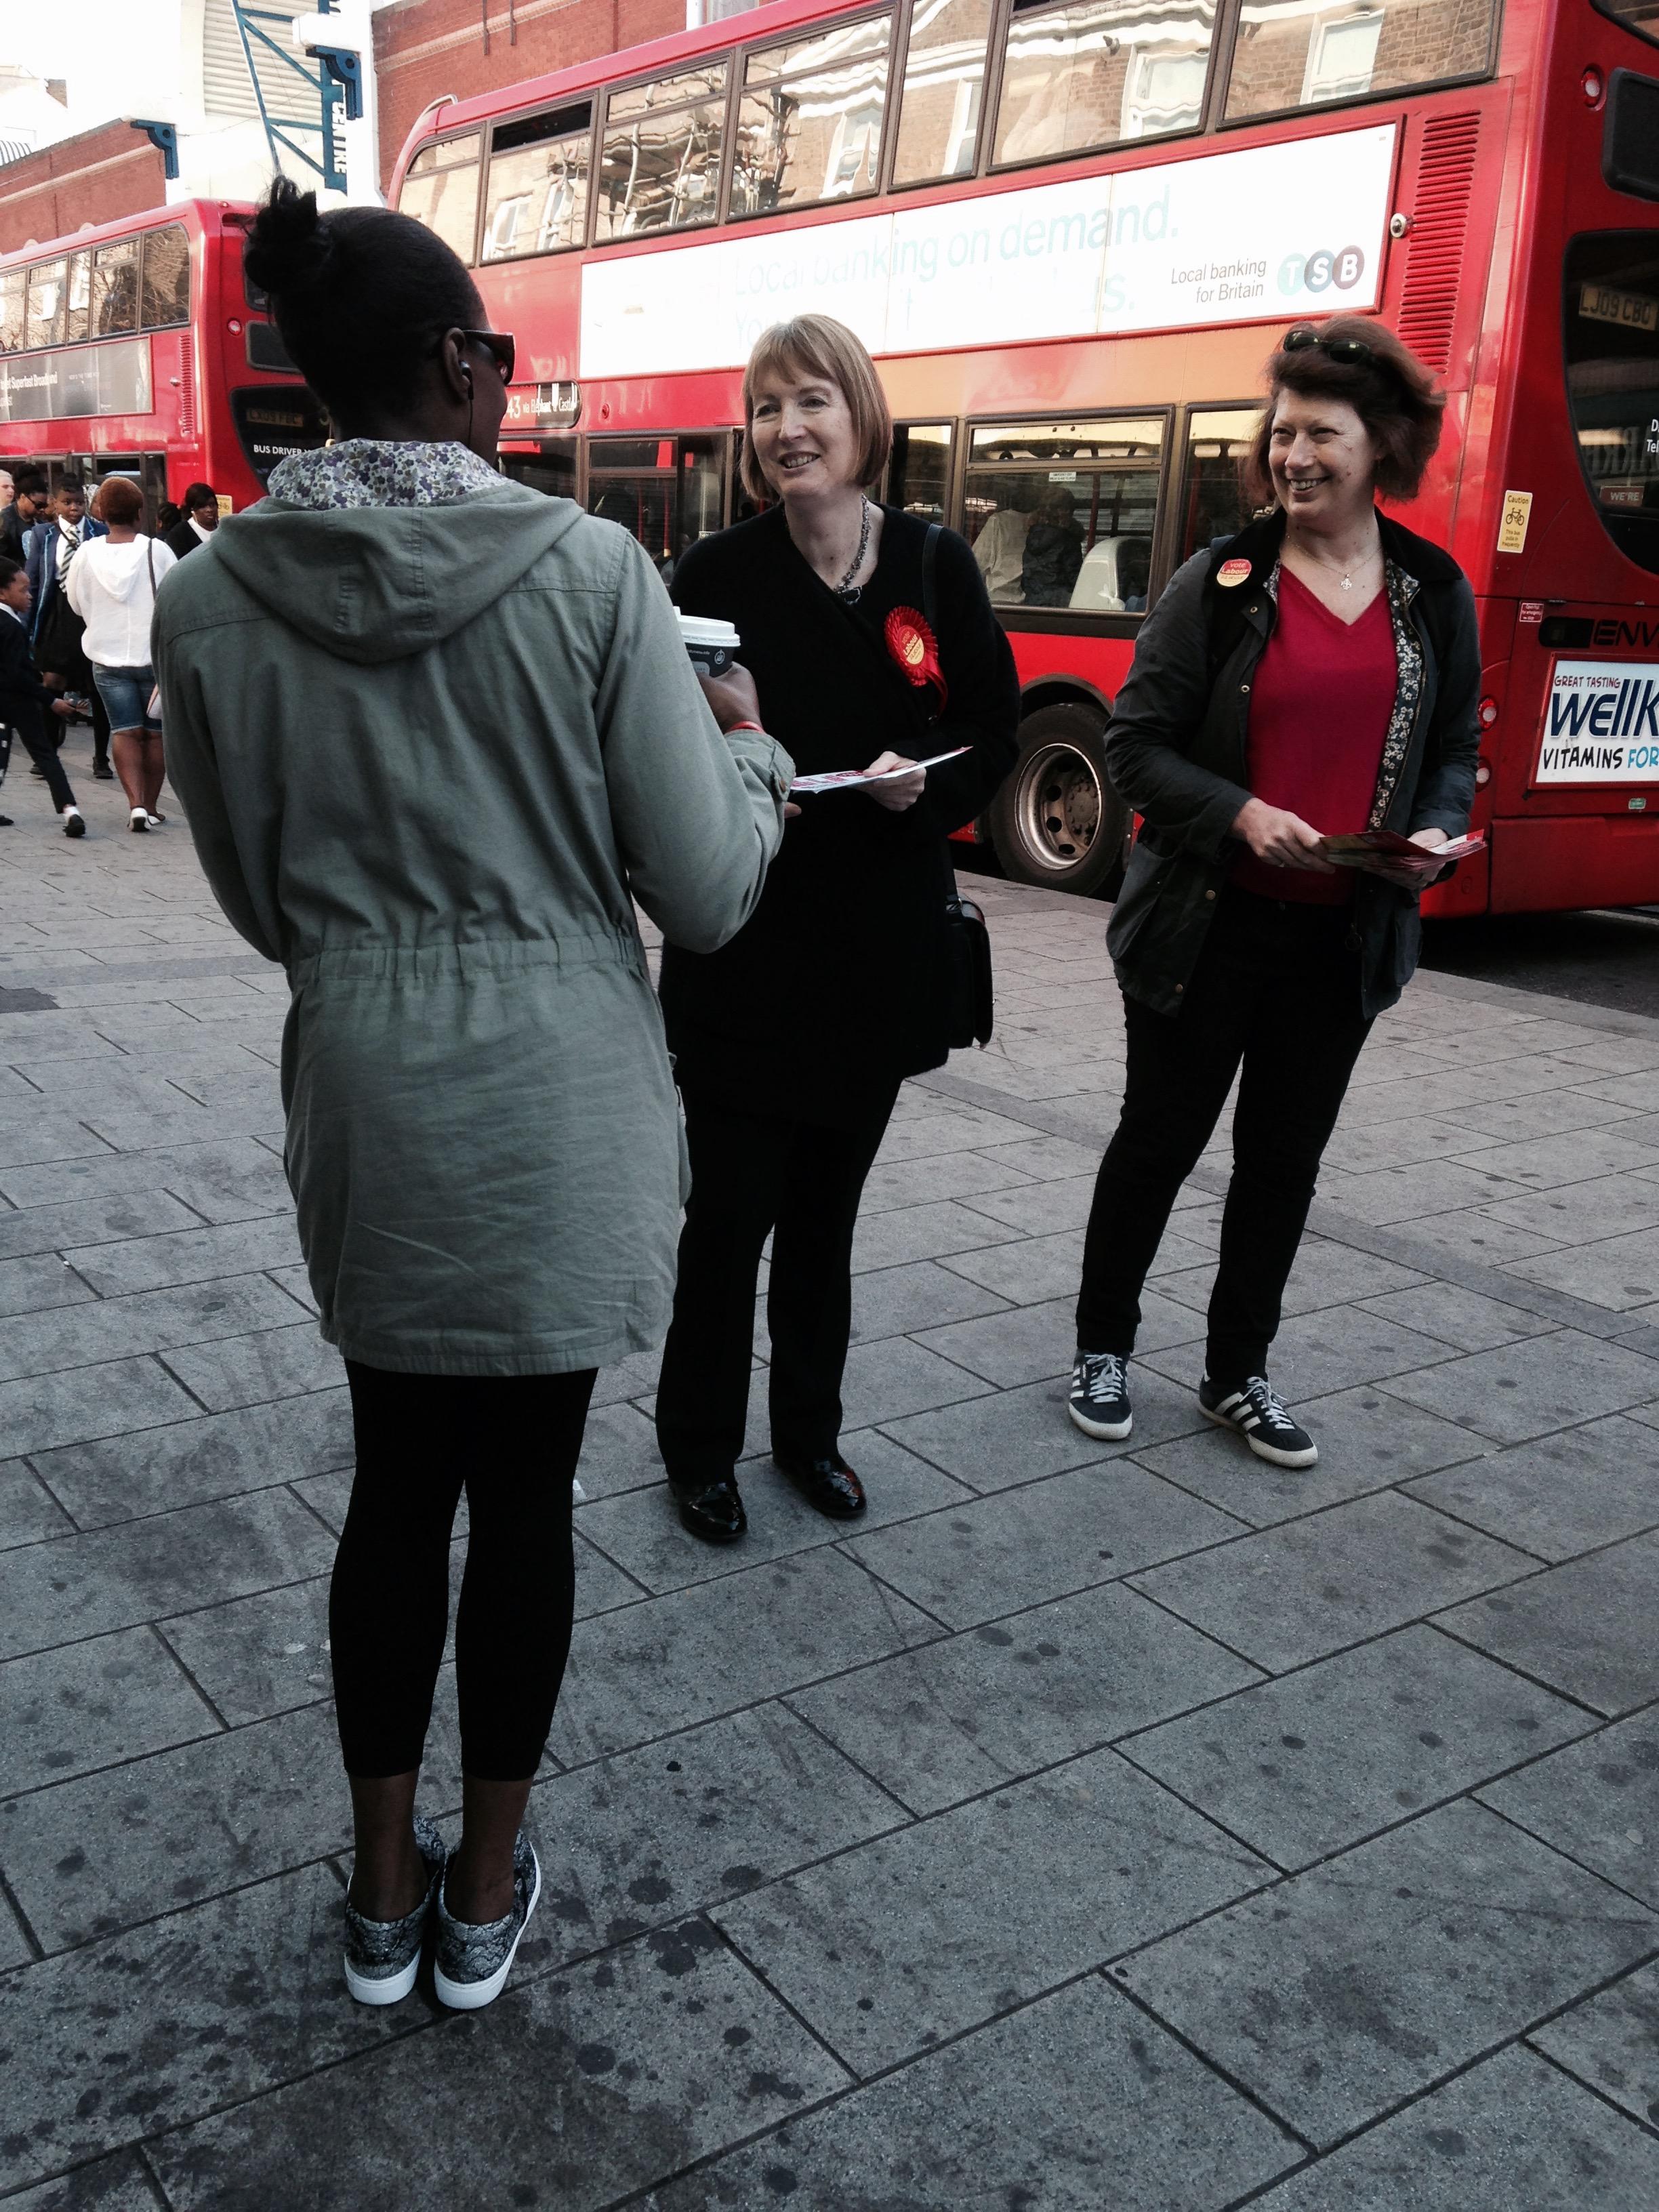 Peckham_bus_stop4_21.4.15.jpg